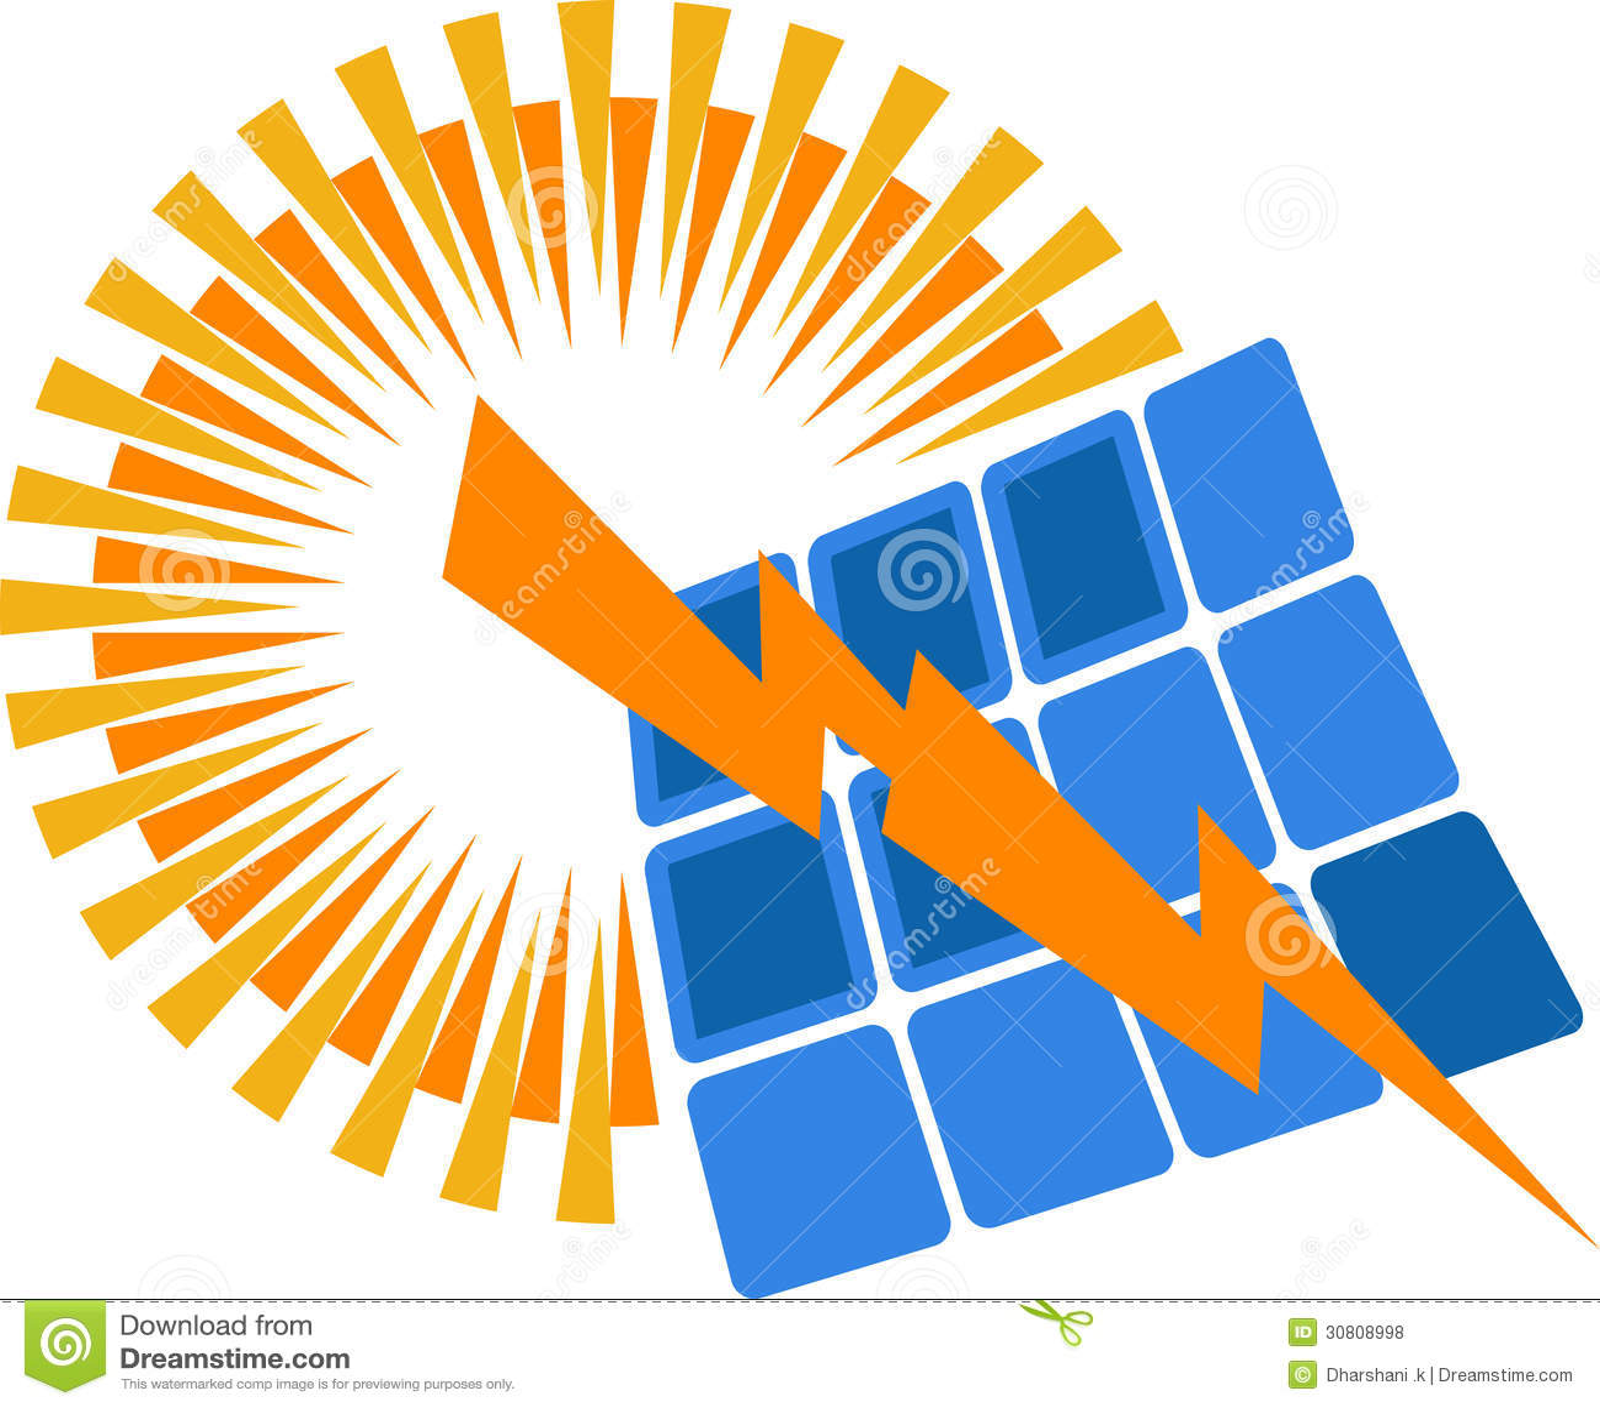 solar power logo royalty free stock photos image 30808998